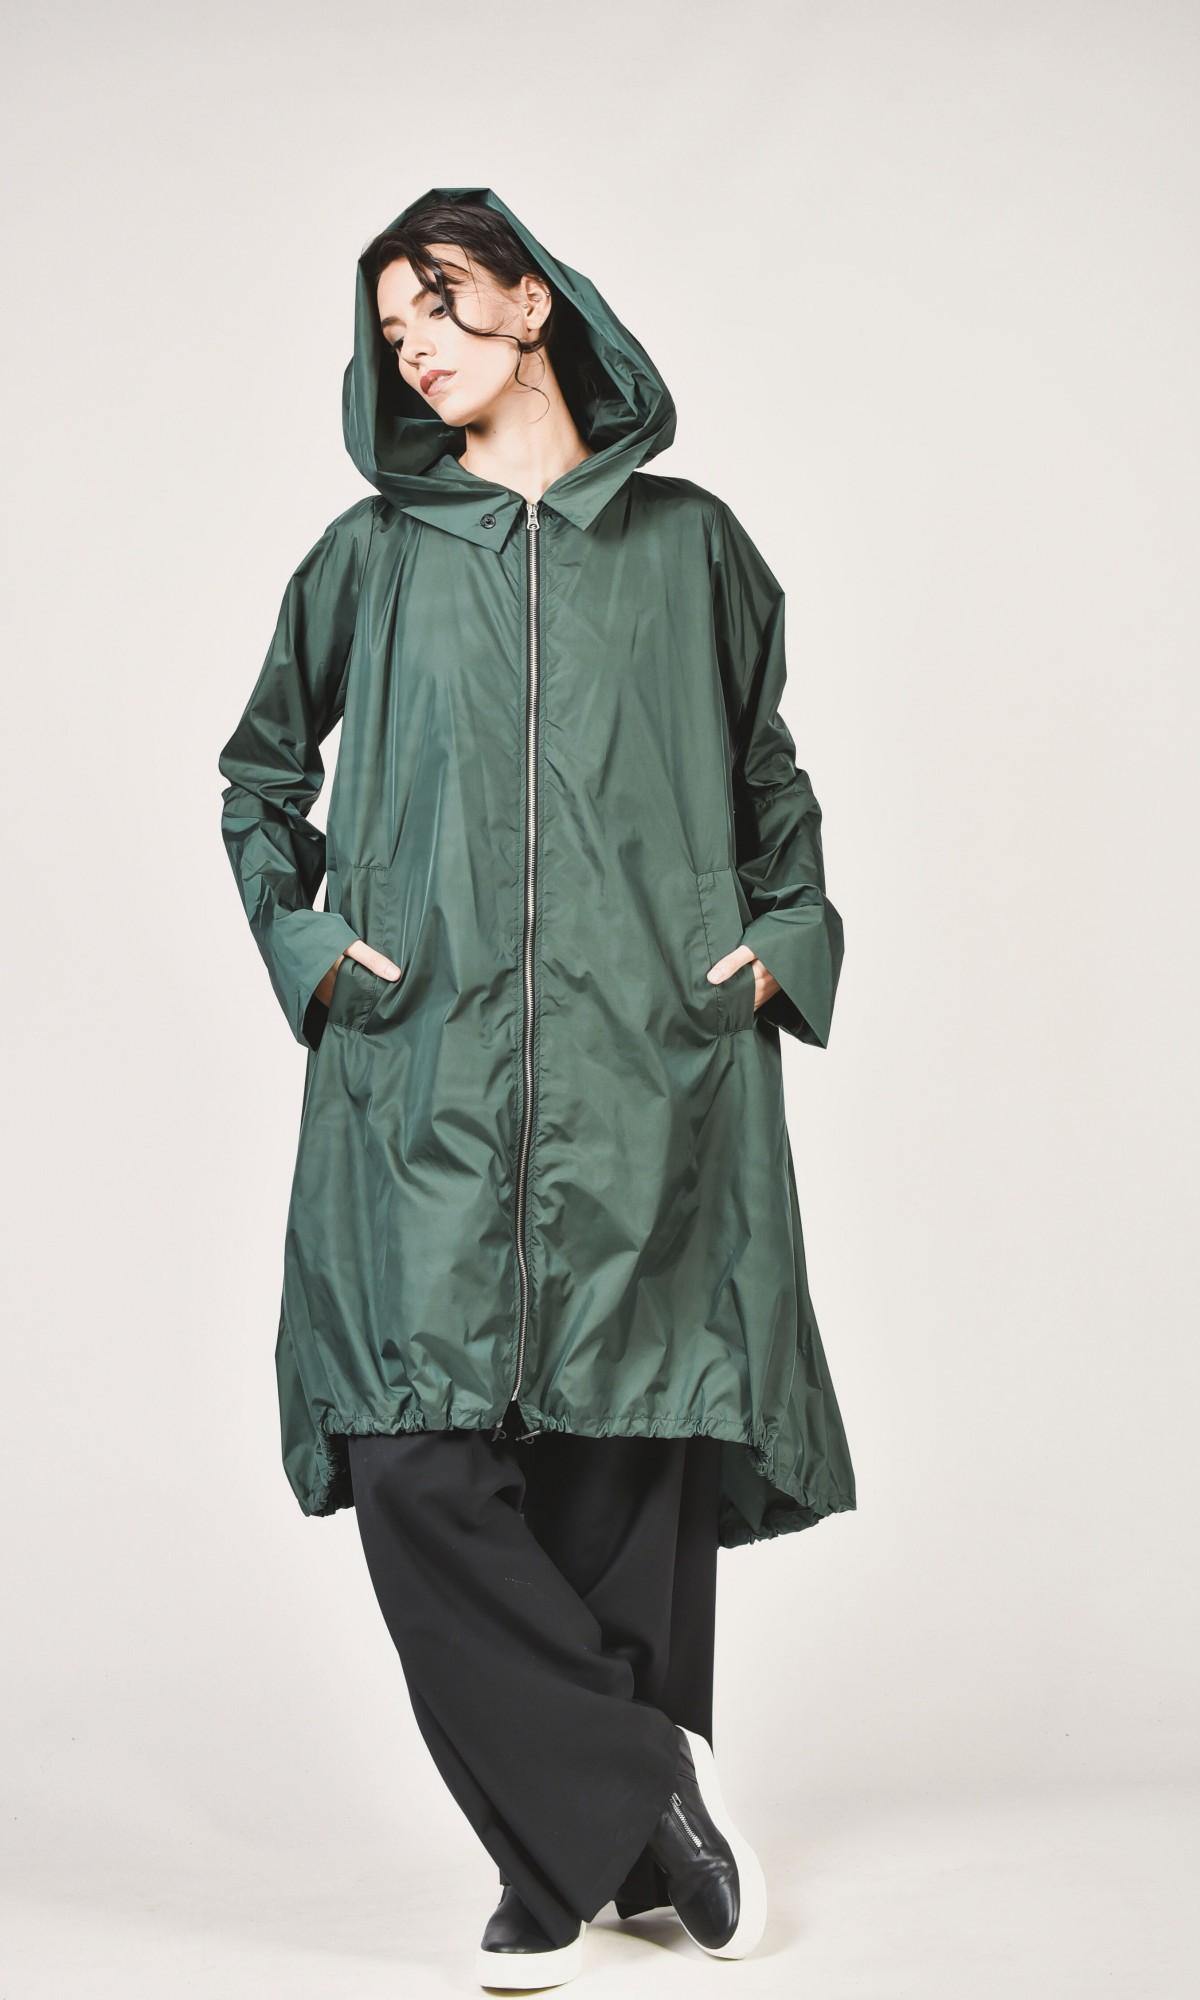 2ece46ecb8c4 Black Zipper Hooded Raincoat